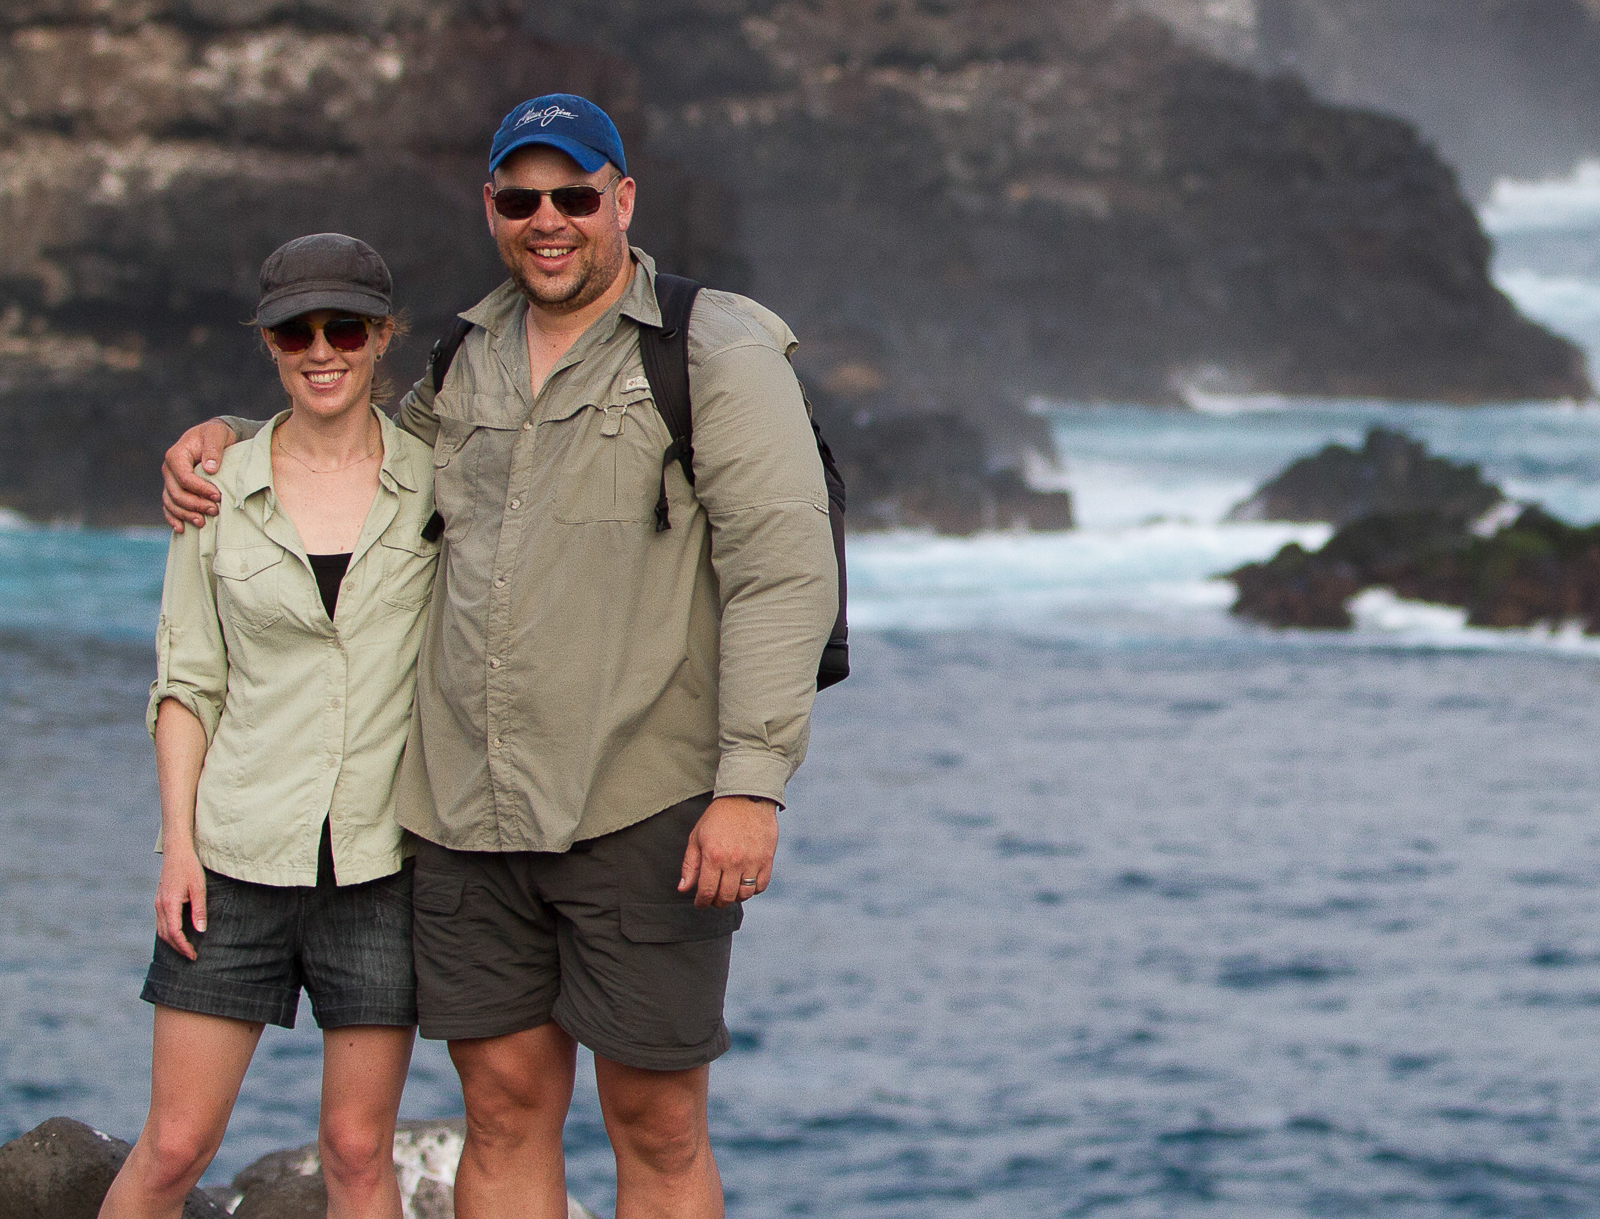 Galapagos Cruise - Honeymoon South America